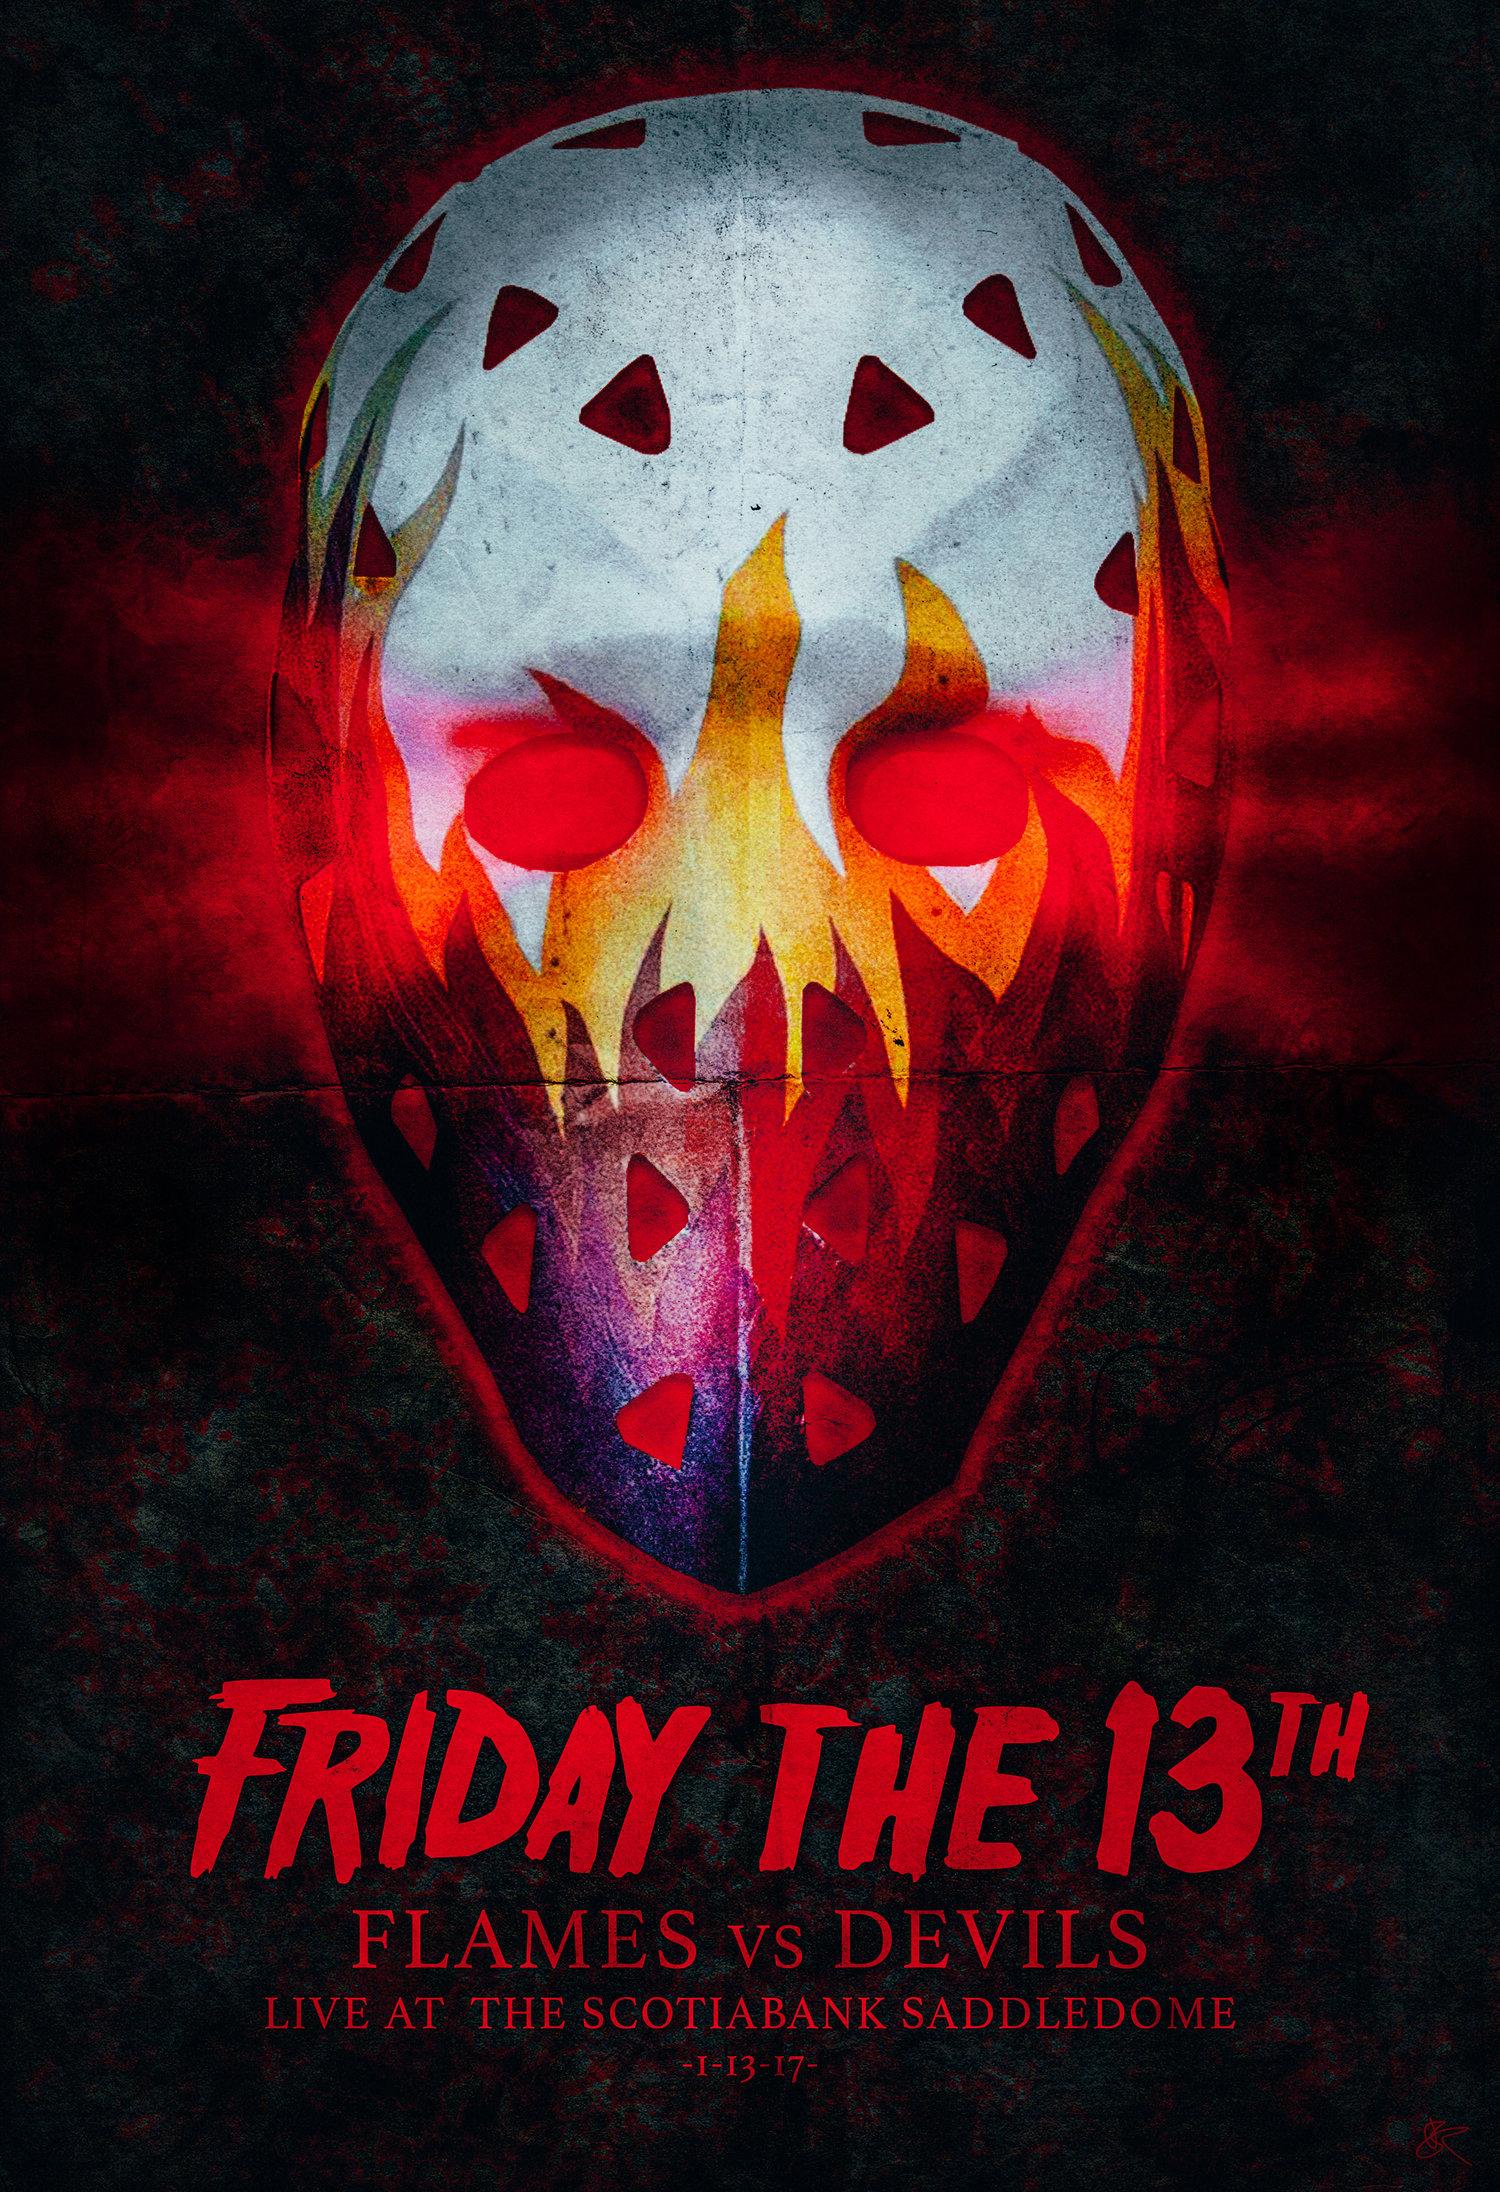 friday the 13th 2017 full movie